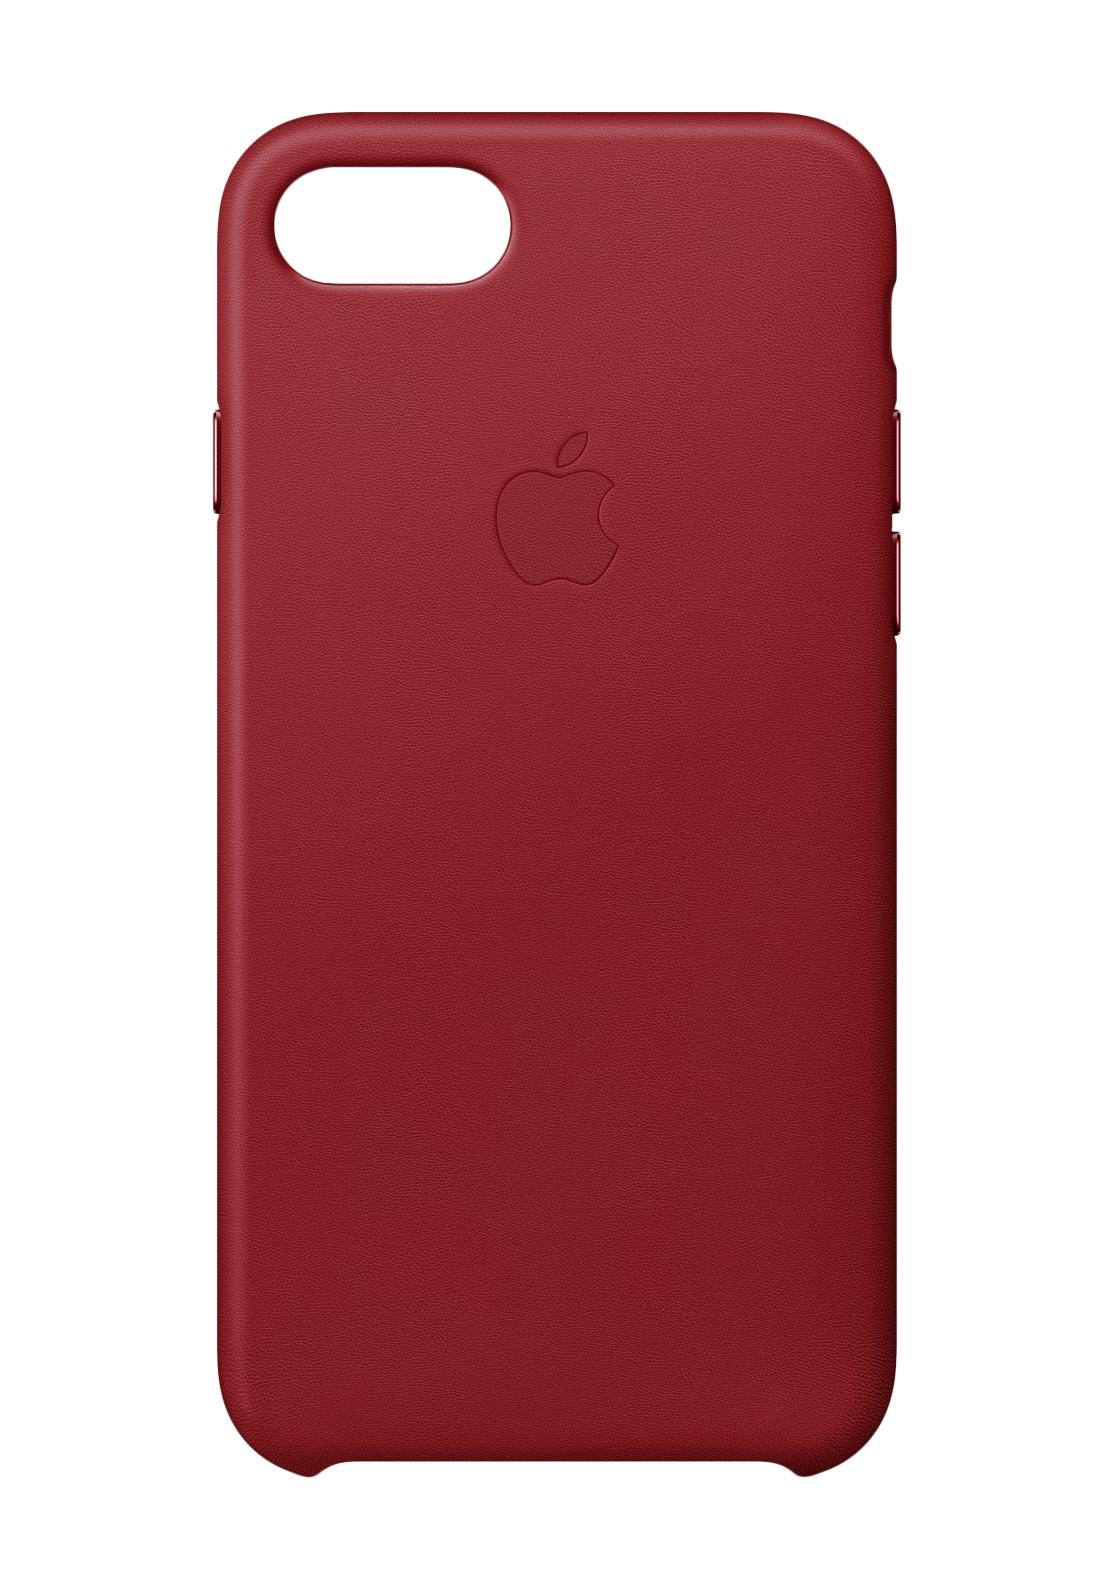 "Apple MQHA2ZM/A funda para teléfono móvil 11,9 cm (4.7"") Funda blanda Rojo"